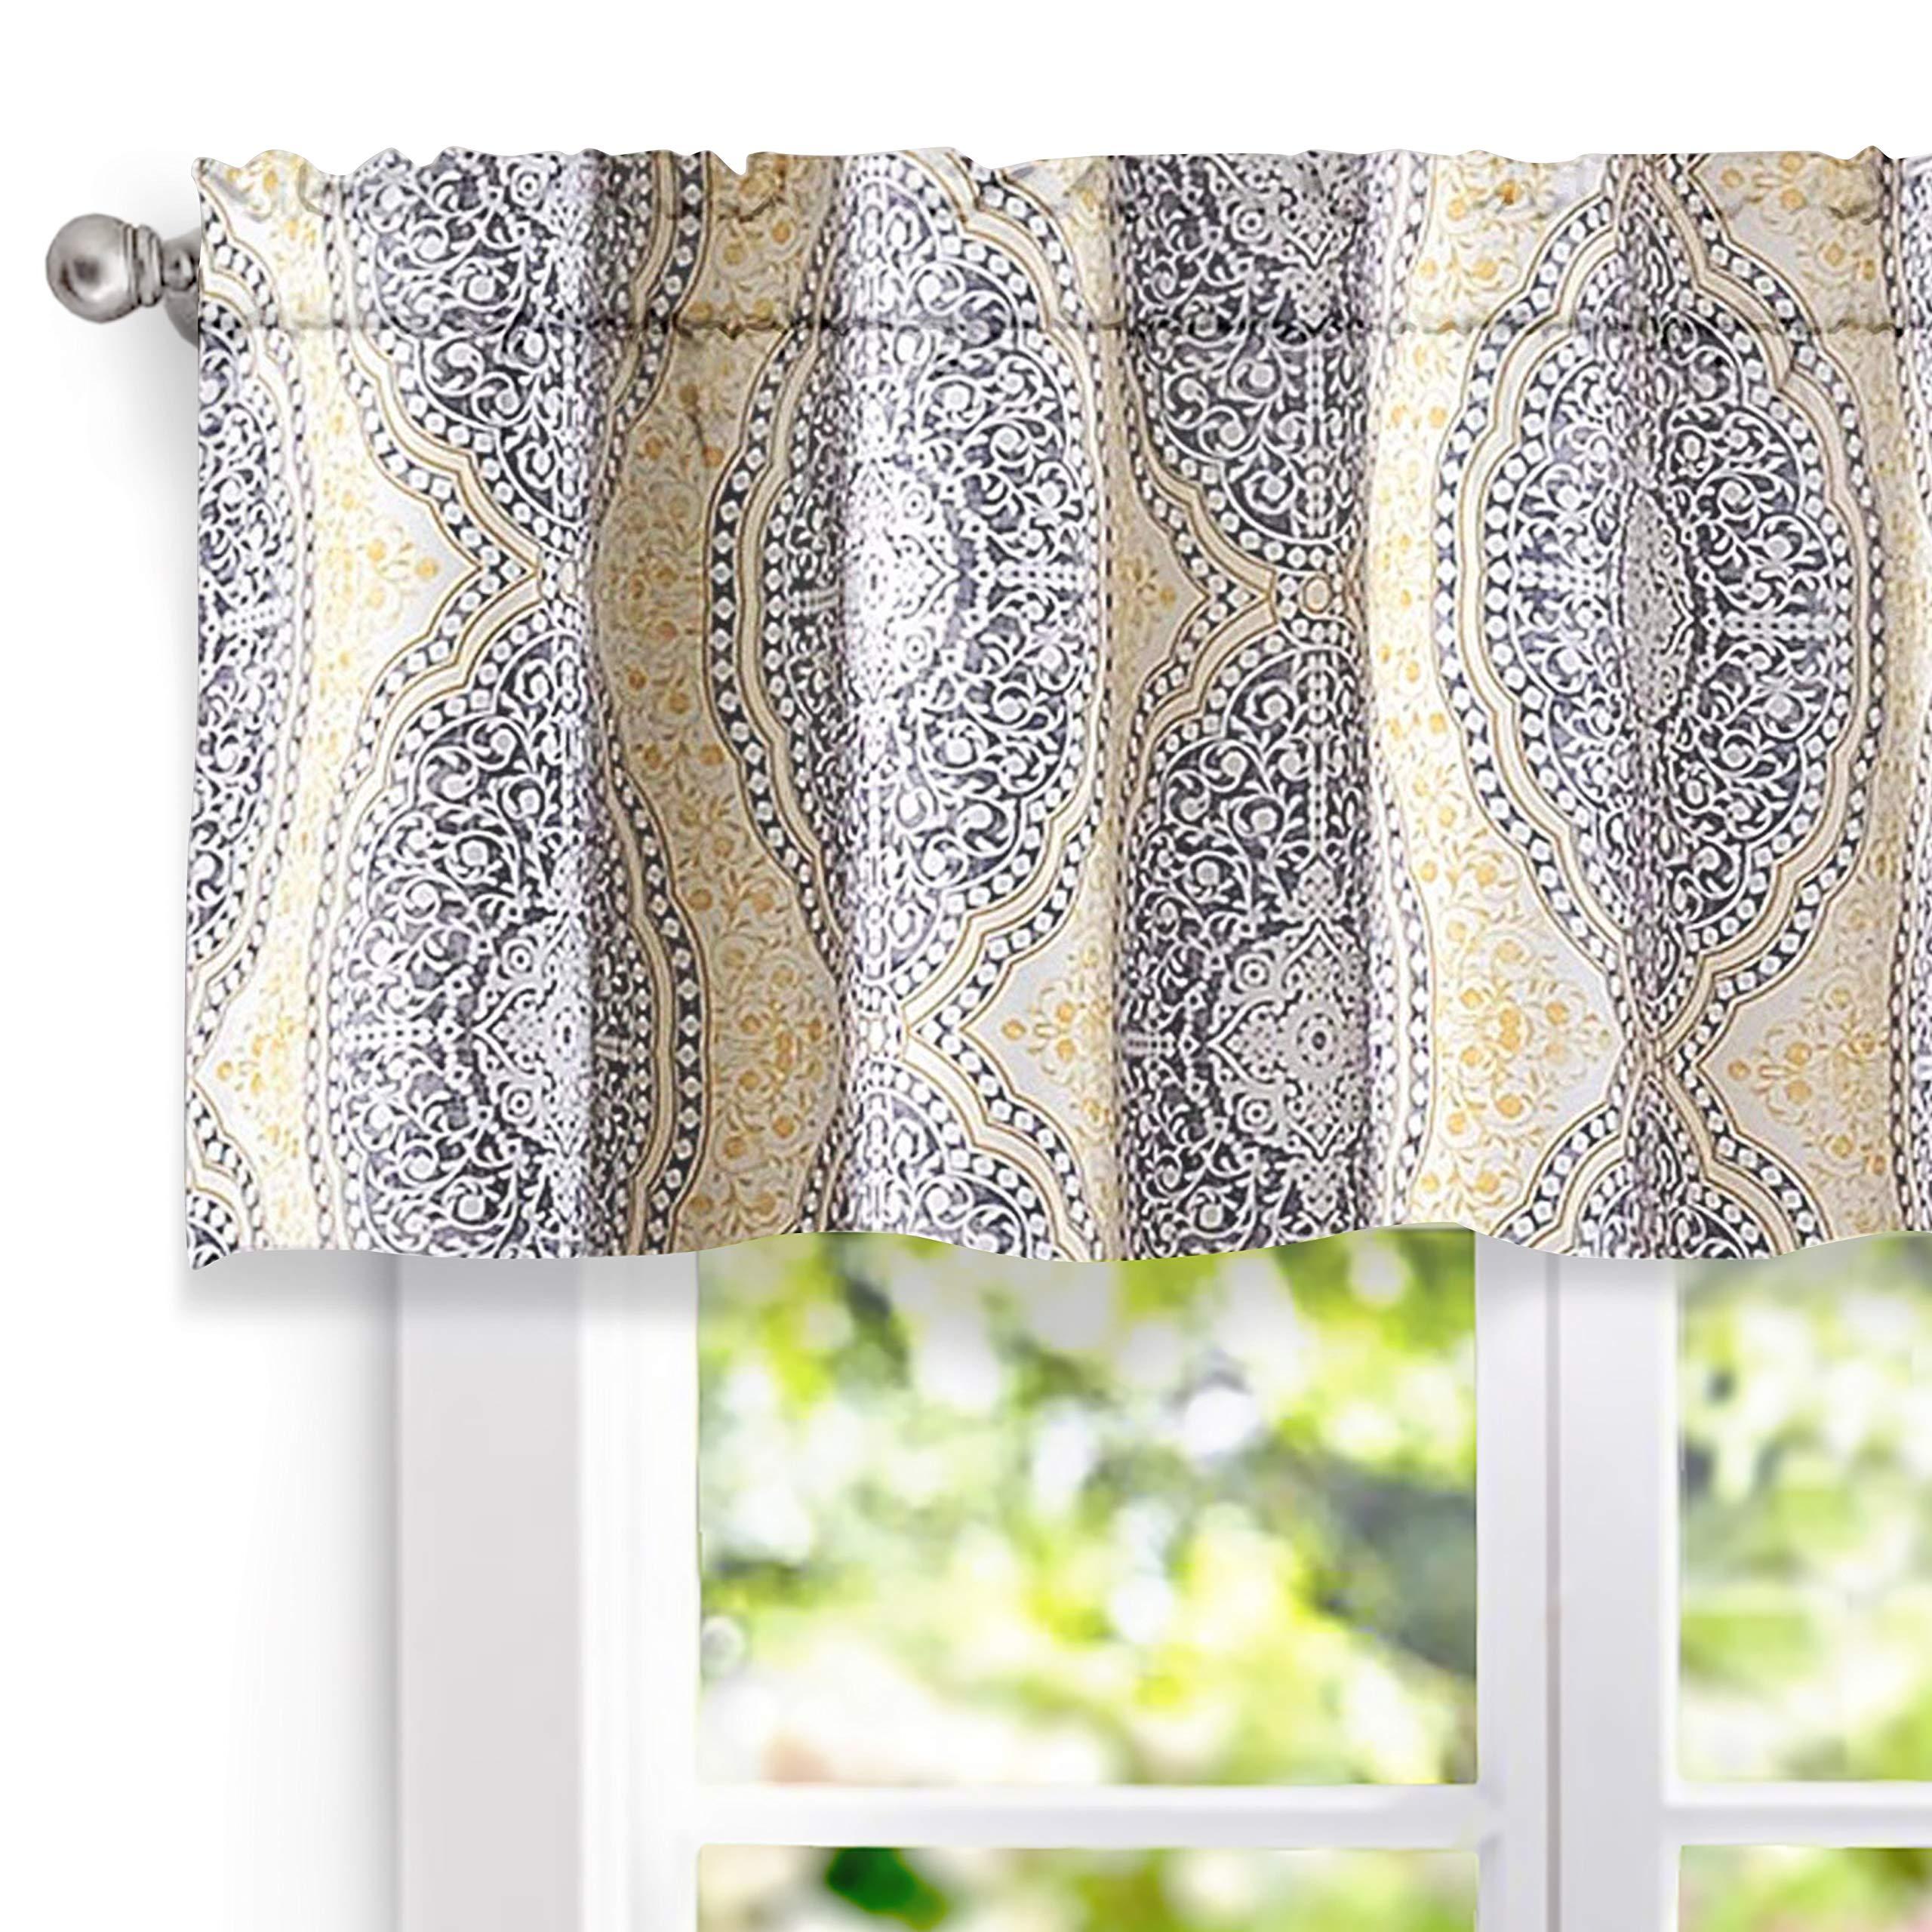 DriftAway Adrianne Damask/Floral Pattern Window Curtain Valance (52''x18'', Yellow/Gray)